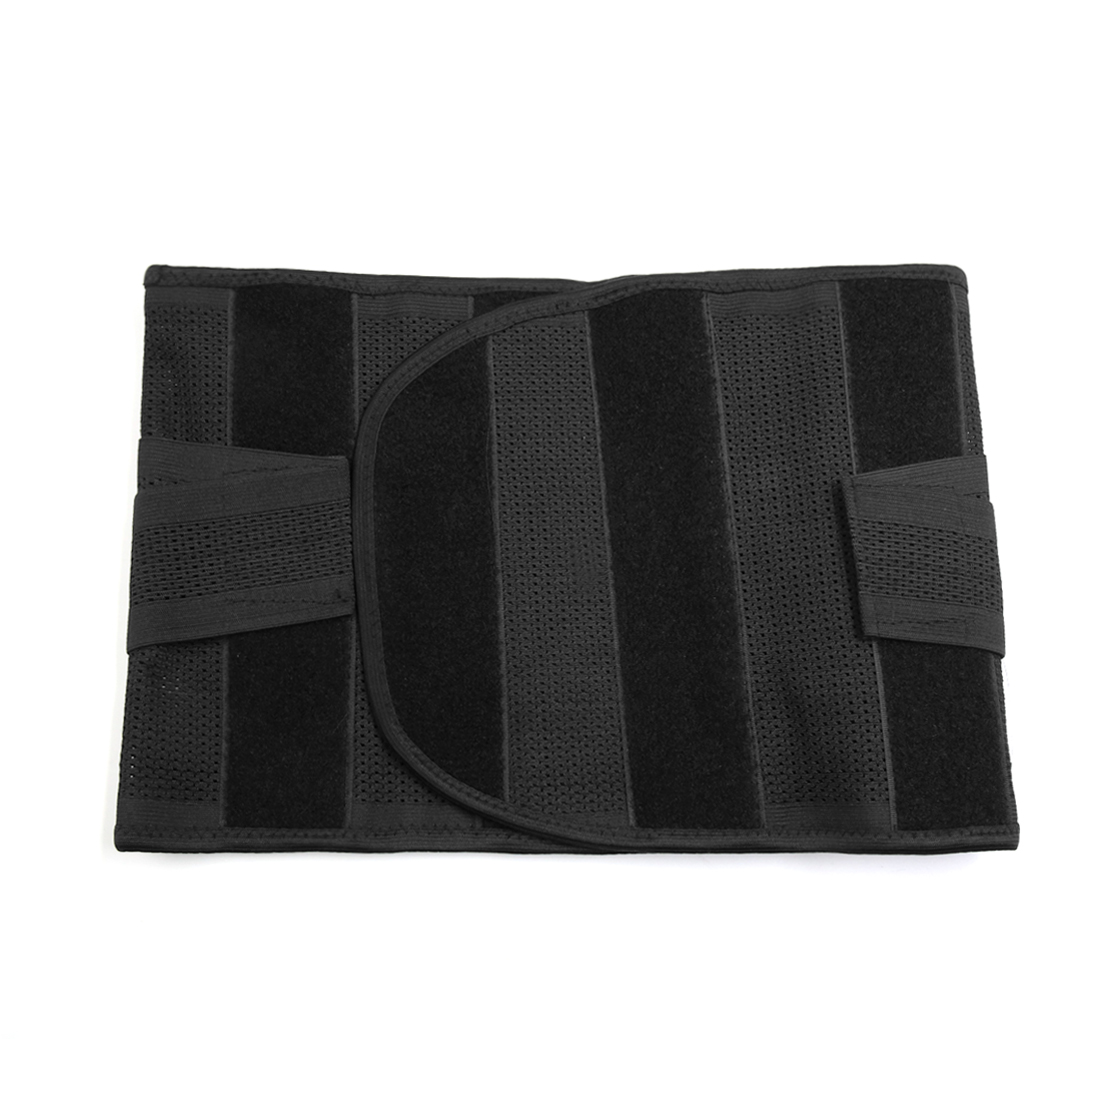 ad6a93d9830fd Black M Elastic Postpartum Recovery Belly Band Abdominal Shaper Support  Belt Shapewear